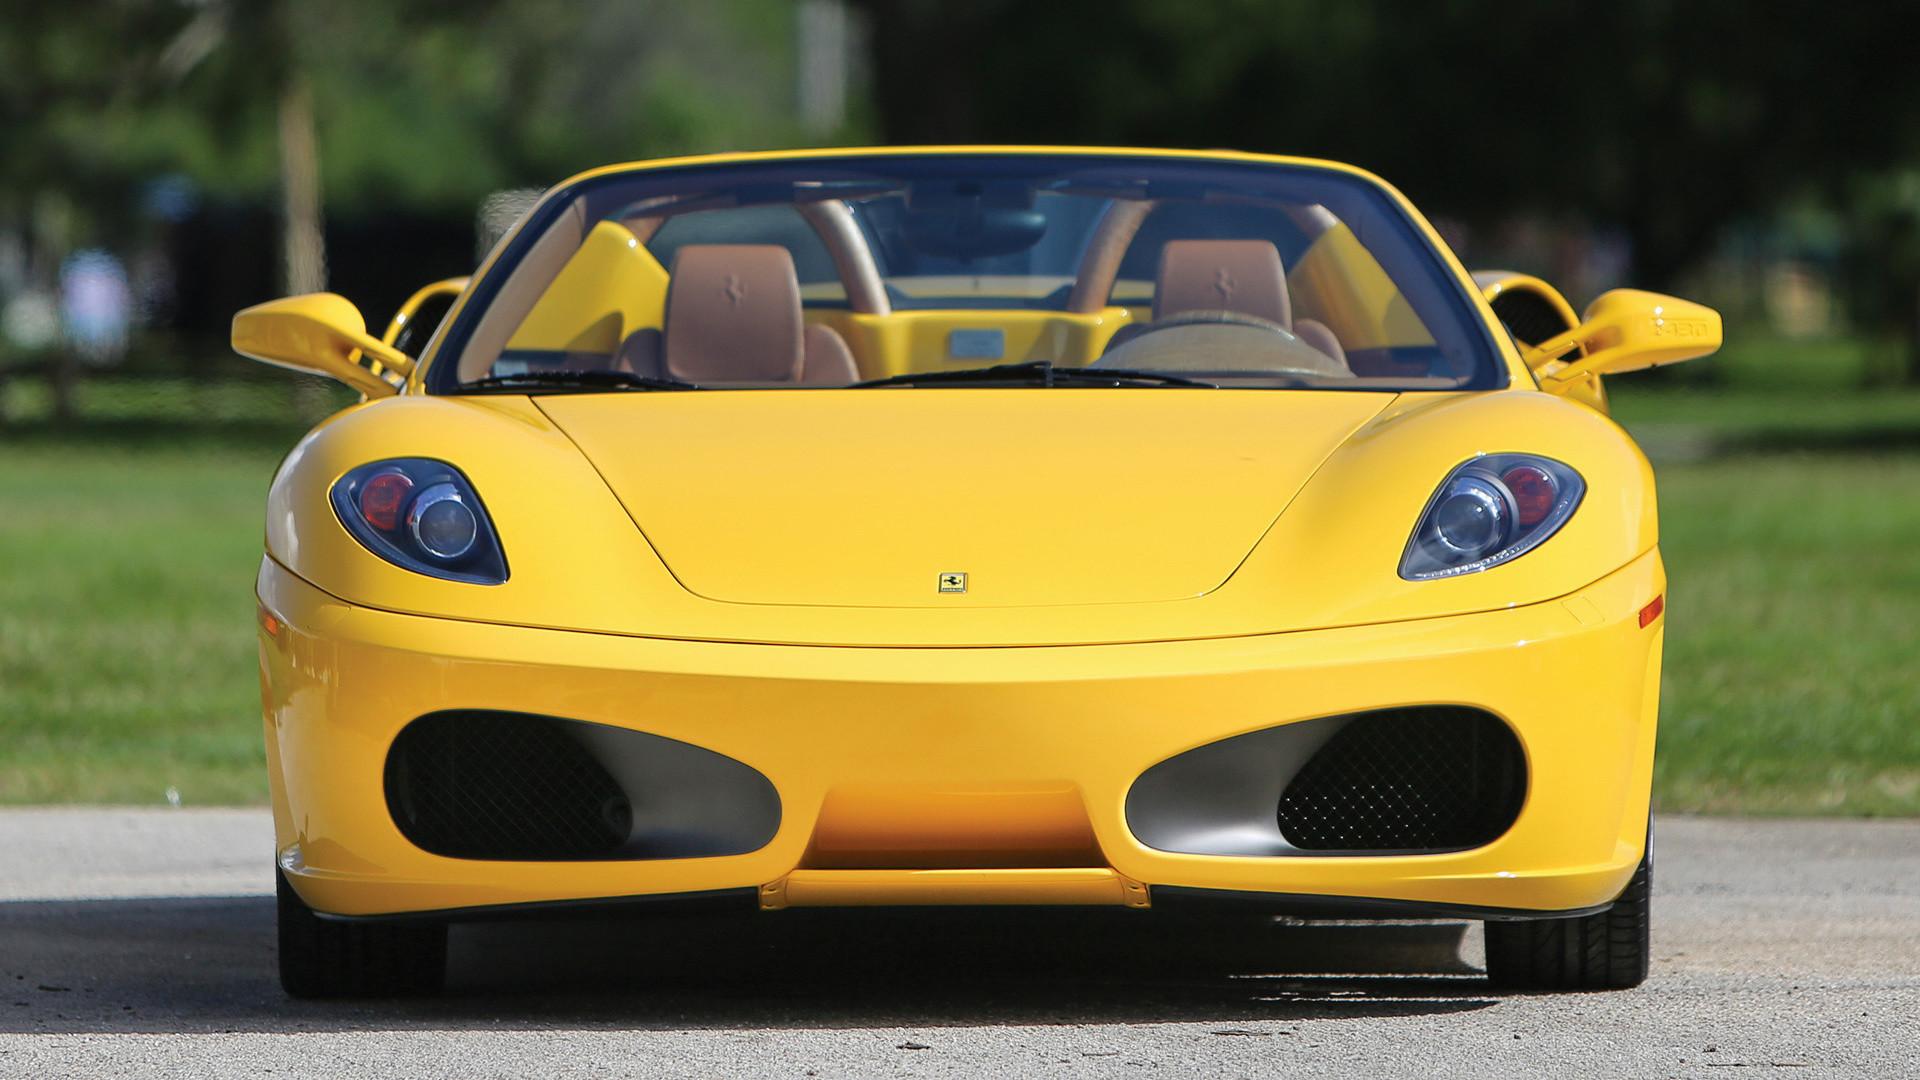 Ferrari F430 Wallpapers 70 Pictures